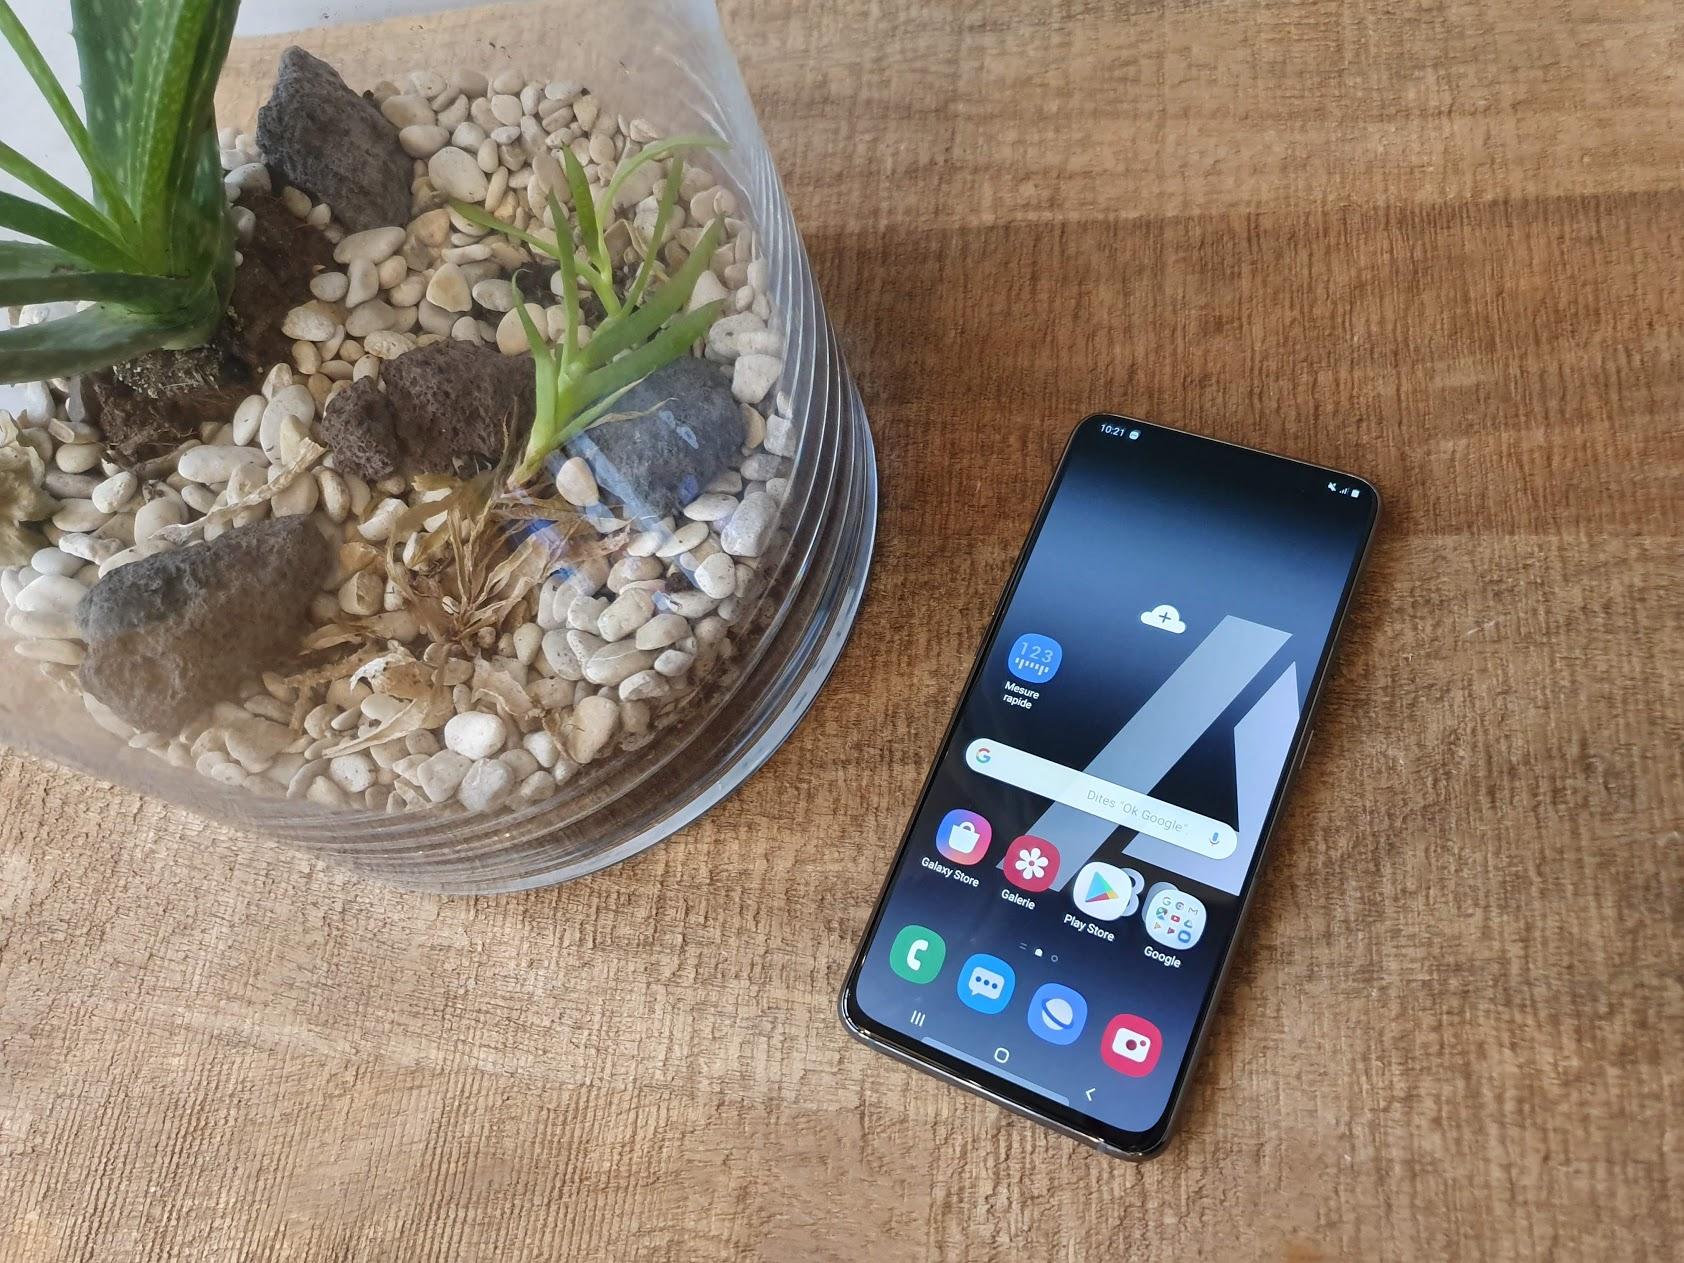 Prise en main du Samsung Galaxy A80 : un flagship de milieu de gamme